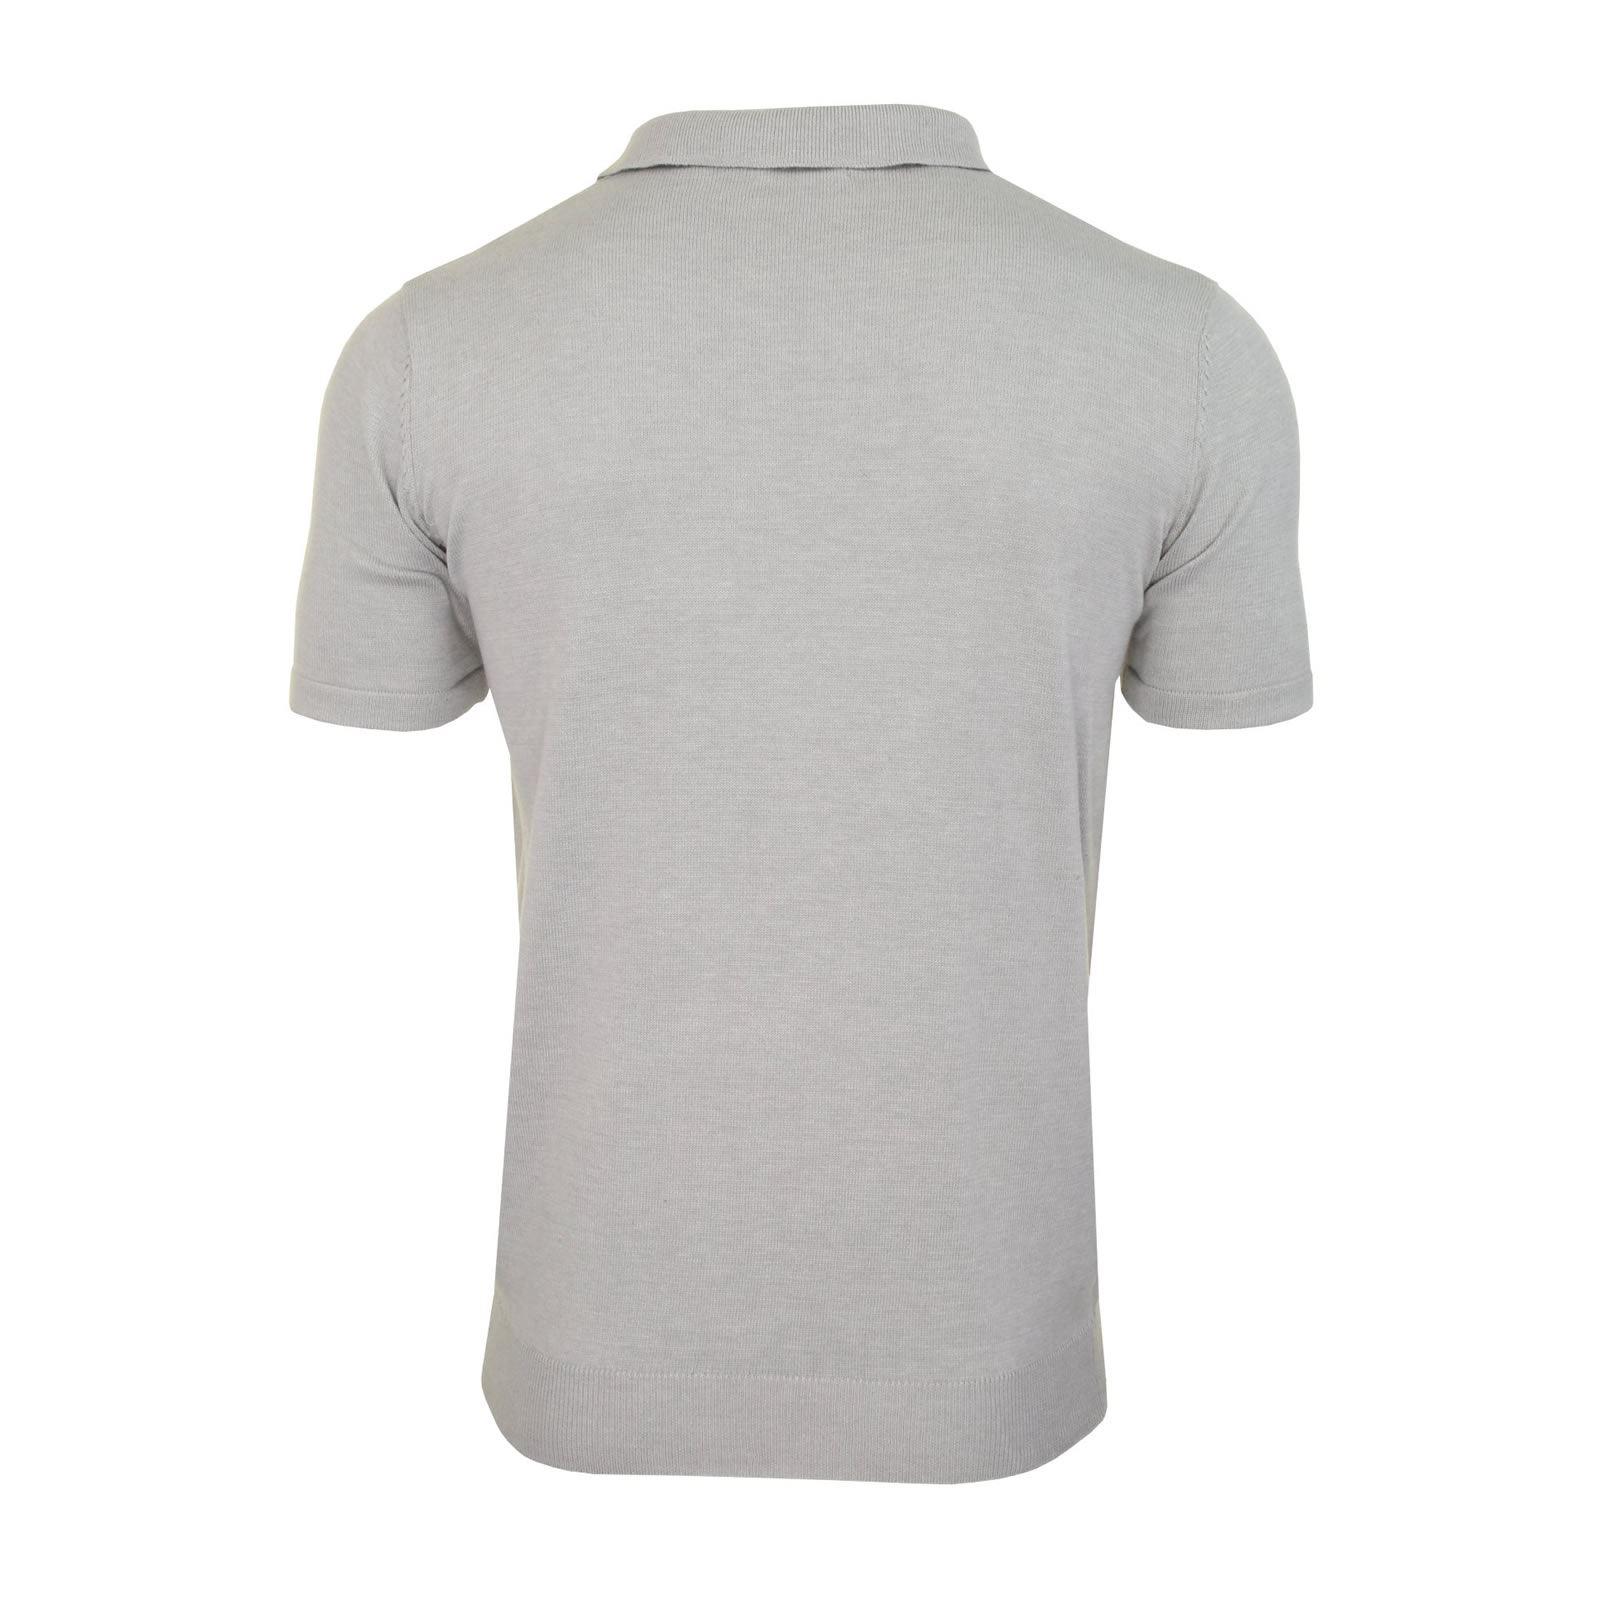 Mens-Knitted-Polo-Brave-Soul-Columbus-Collared-Short-Sleeve-Jumper-T-Shirt thumbnail 11